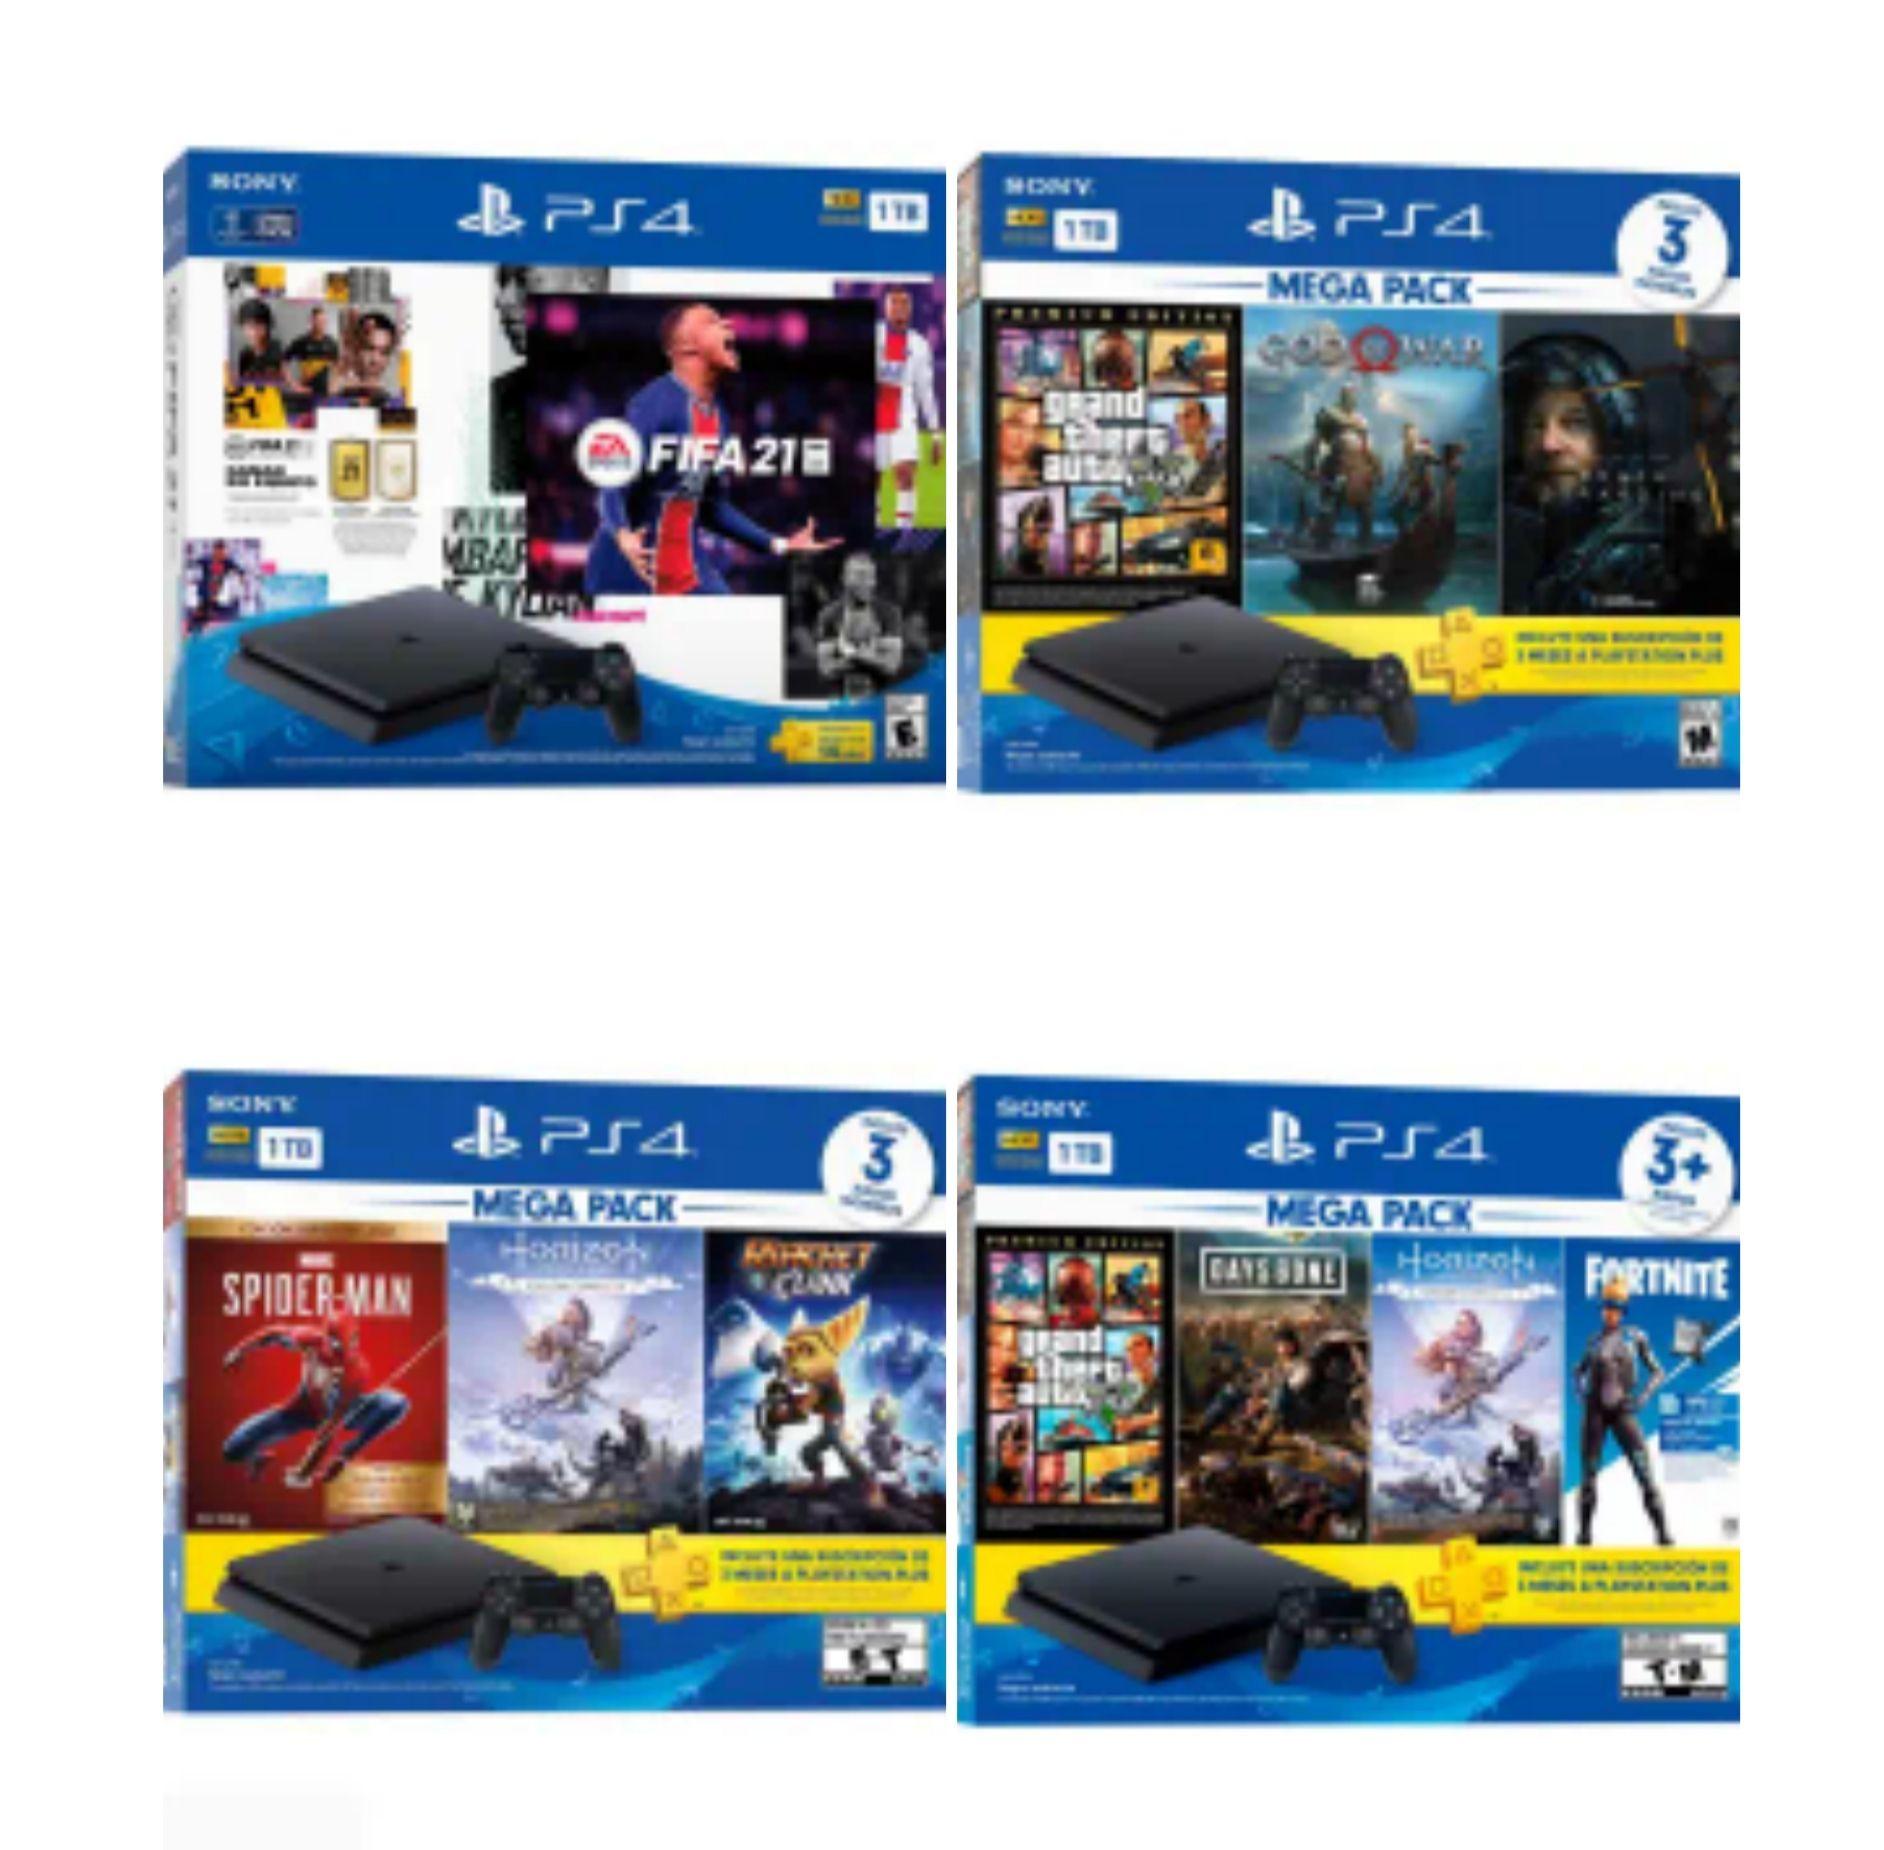 Sam's Club: Consola PlayStation 4 MegaPack 15 + Marvel Spider-man + Ratchet & Clank + Horizon Zero Dawn y más(con HSBC)